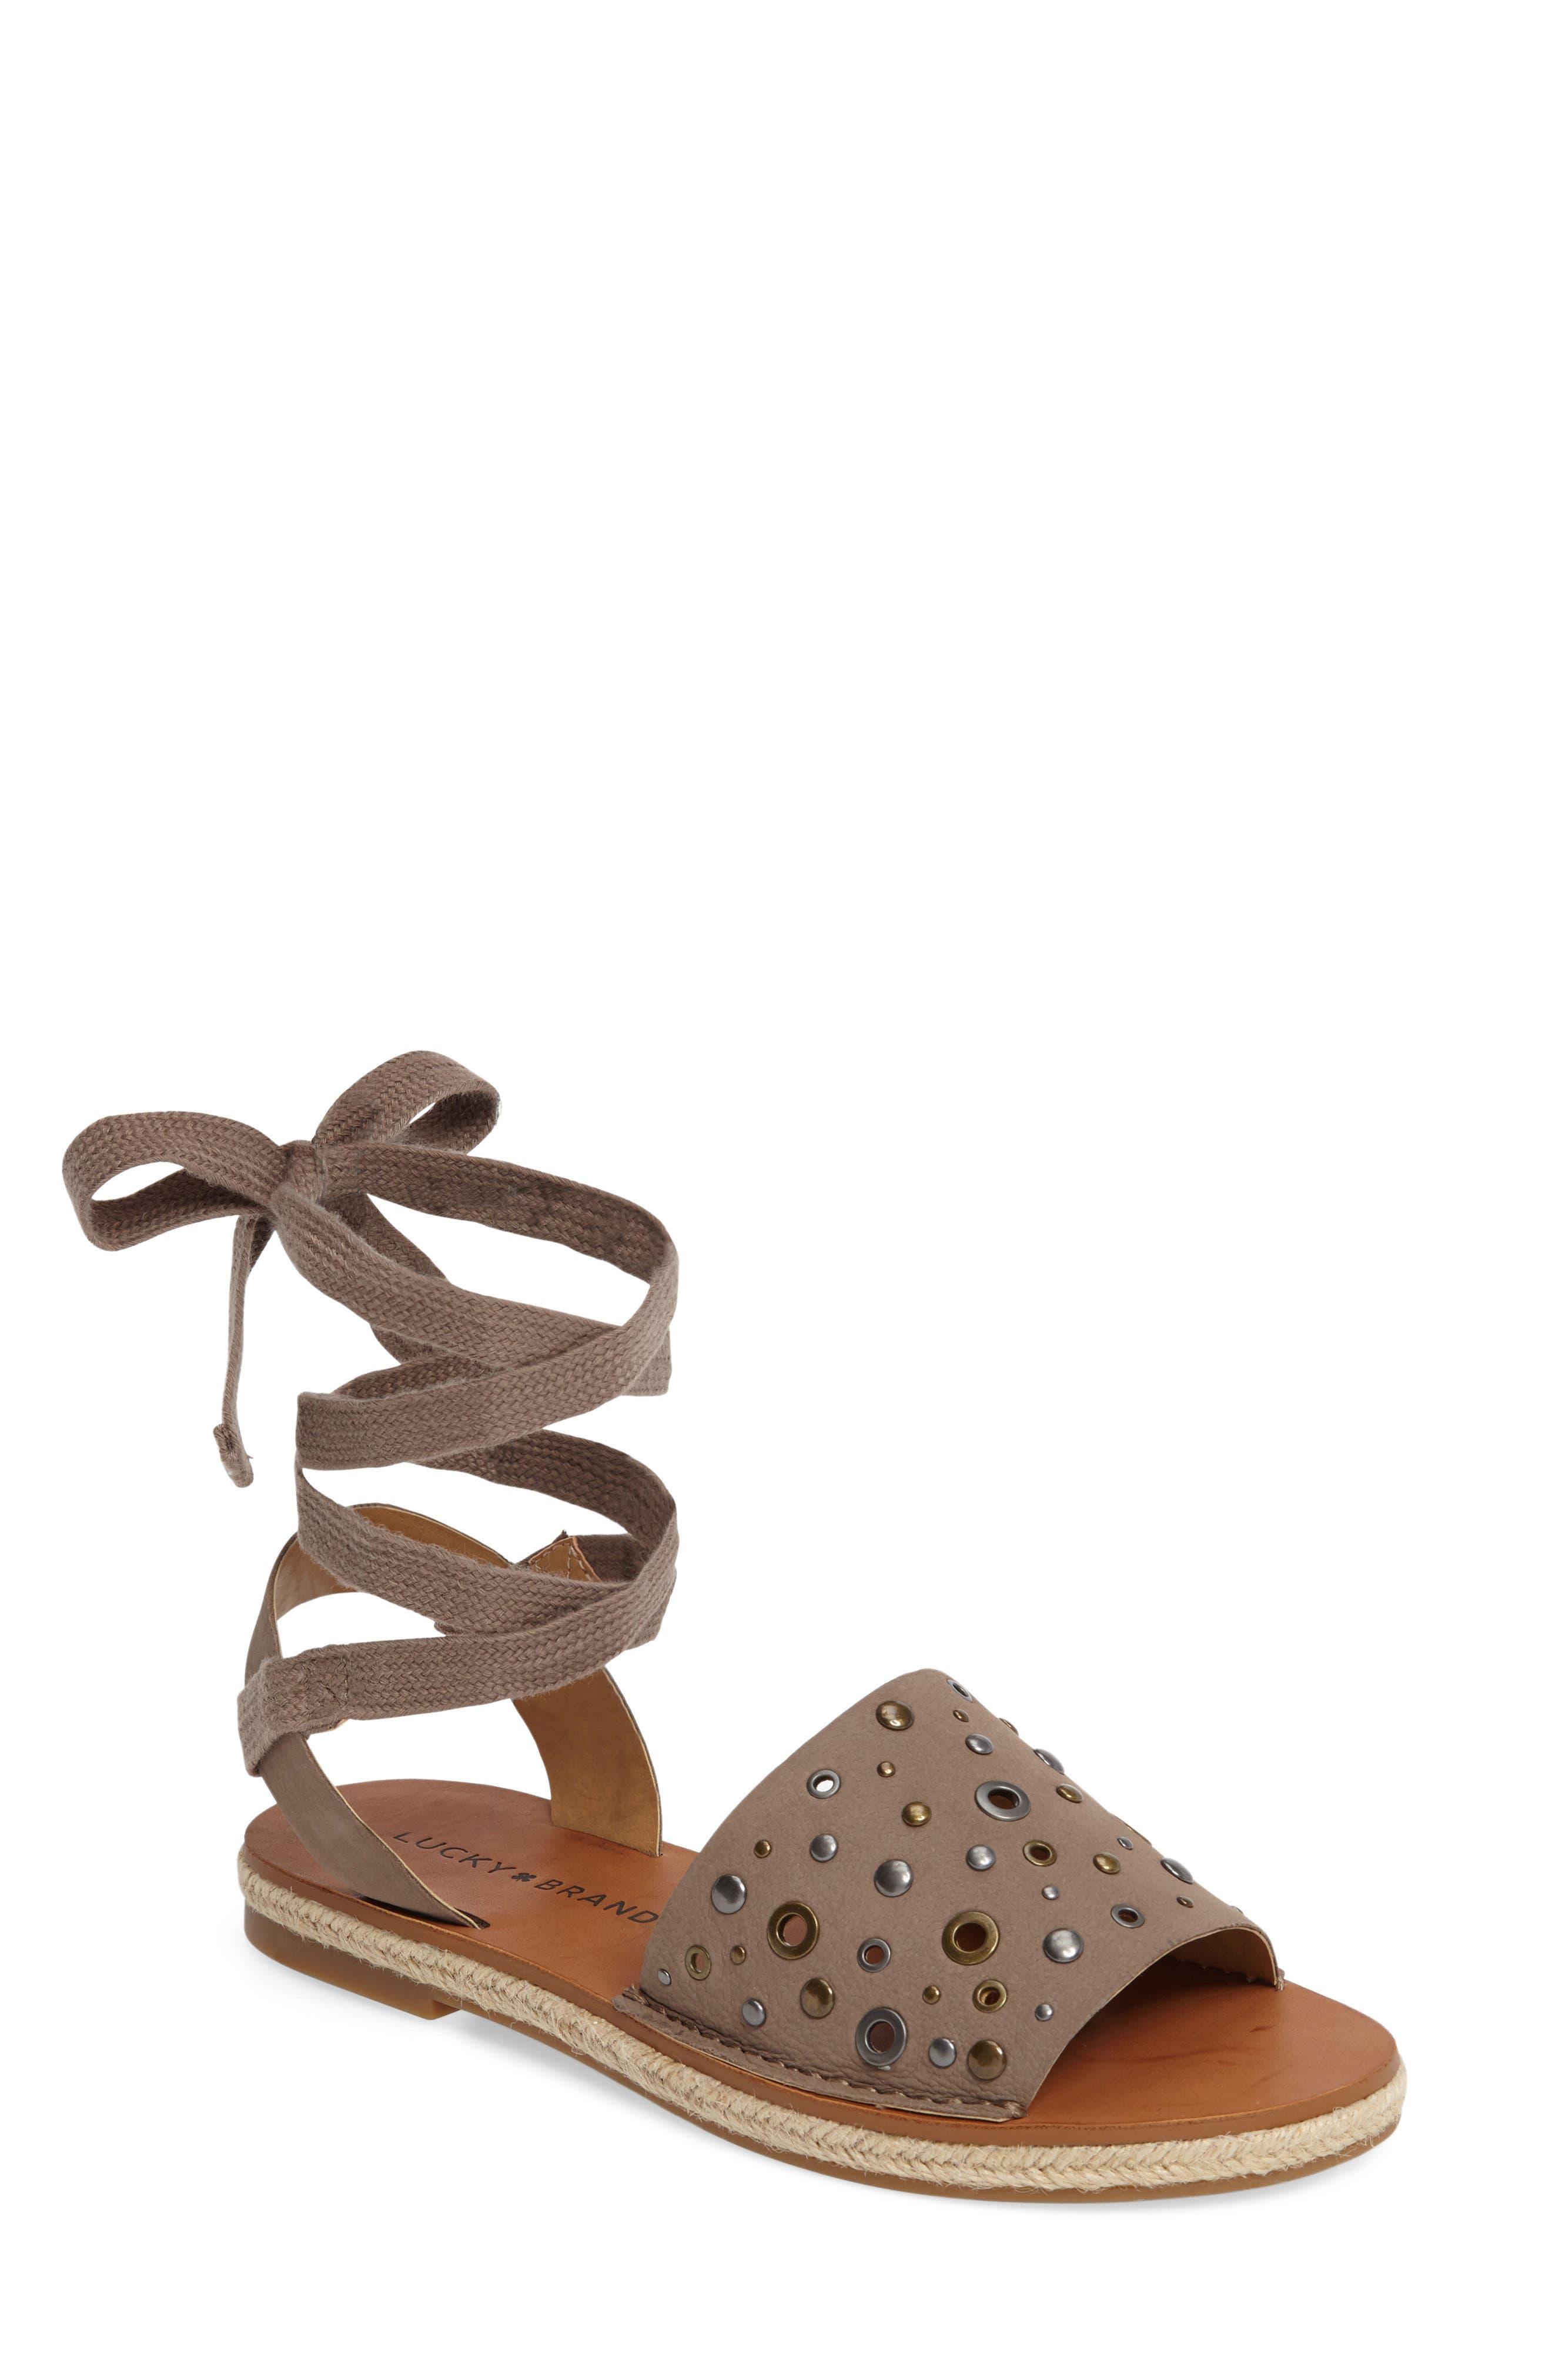 Daytah Ankle Tie Sandal,                             Main thumbnail 2, color,